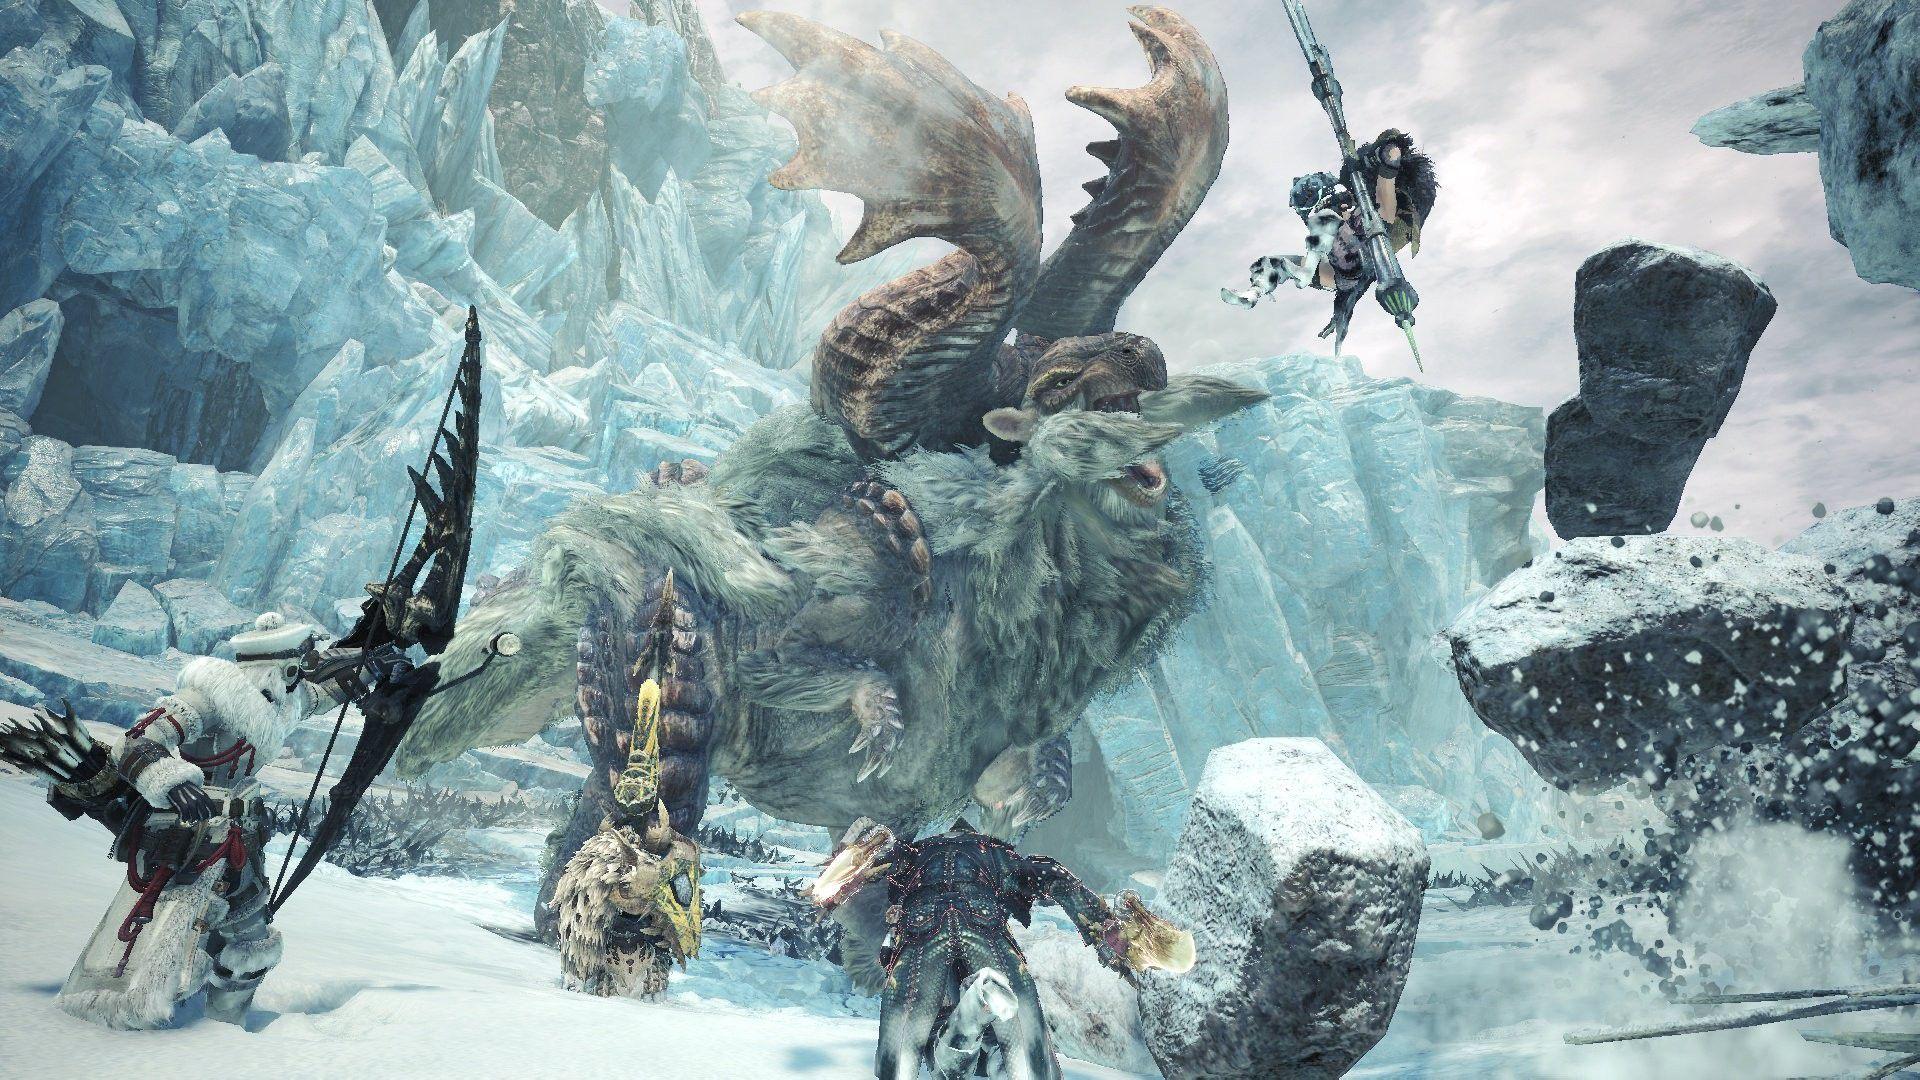 「Monster Hunter World: Iceborne」の画像検索結果